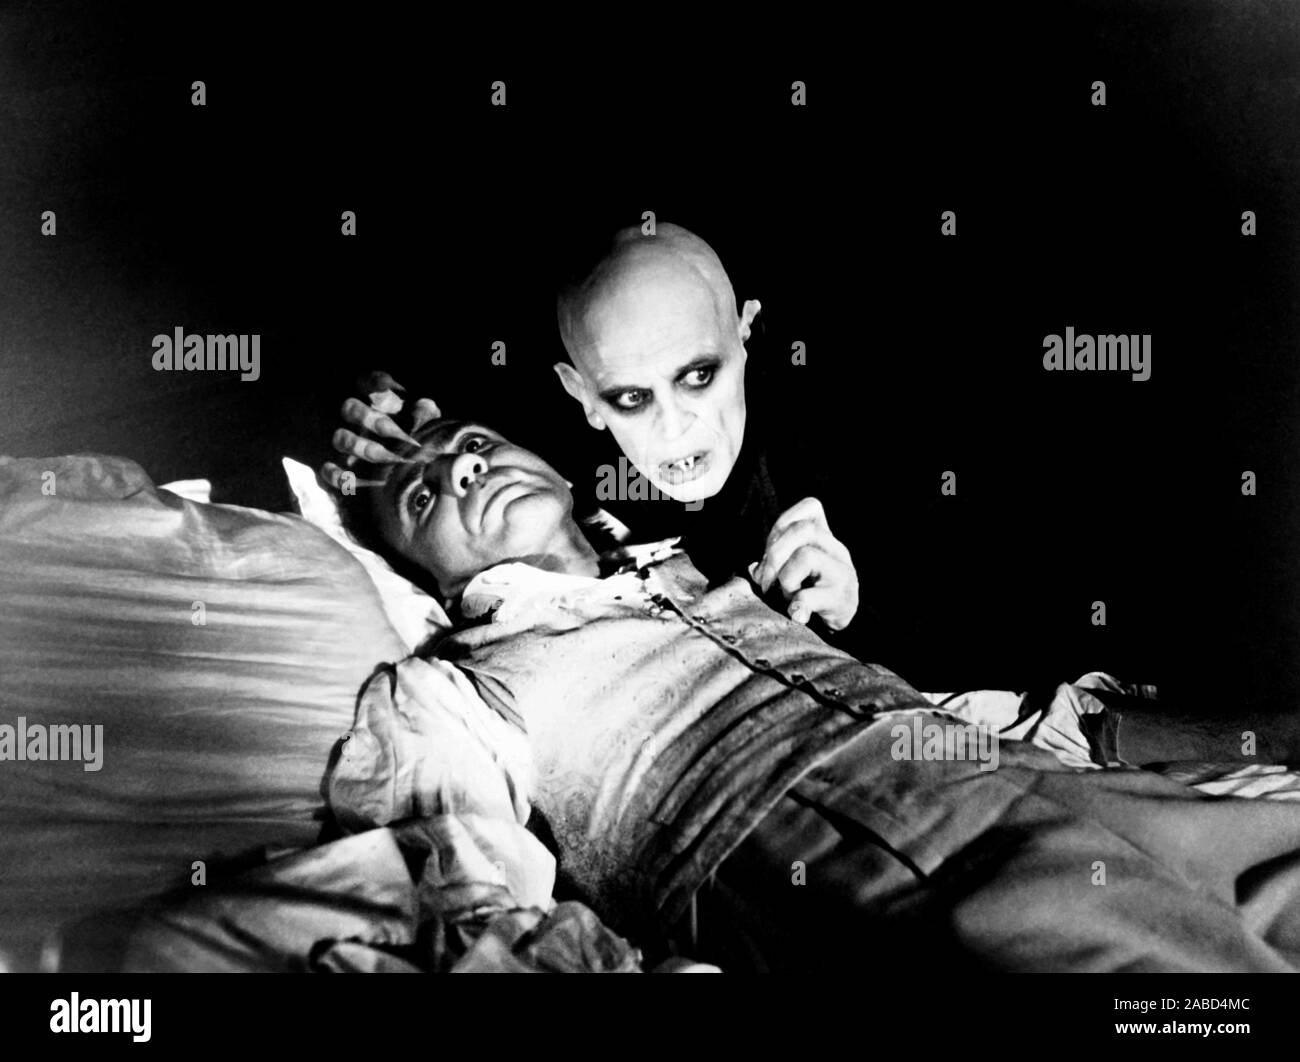 NOSFERATU THE VAMPYRE, (aka NOSFERATU: PHANTOM DER NACHT), from left, Bruno Ganz, Klaus Kinski, 1979, TM & Copyright ©20th Century Fox Film Corp. All rights reserved/courtesy Everett Collection Stock Photo